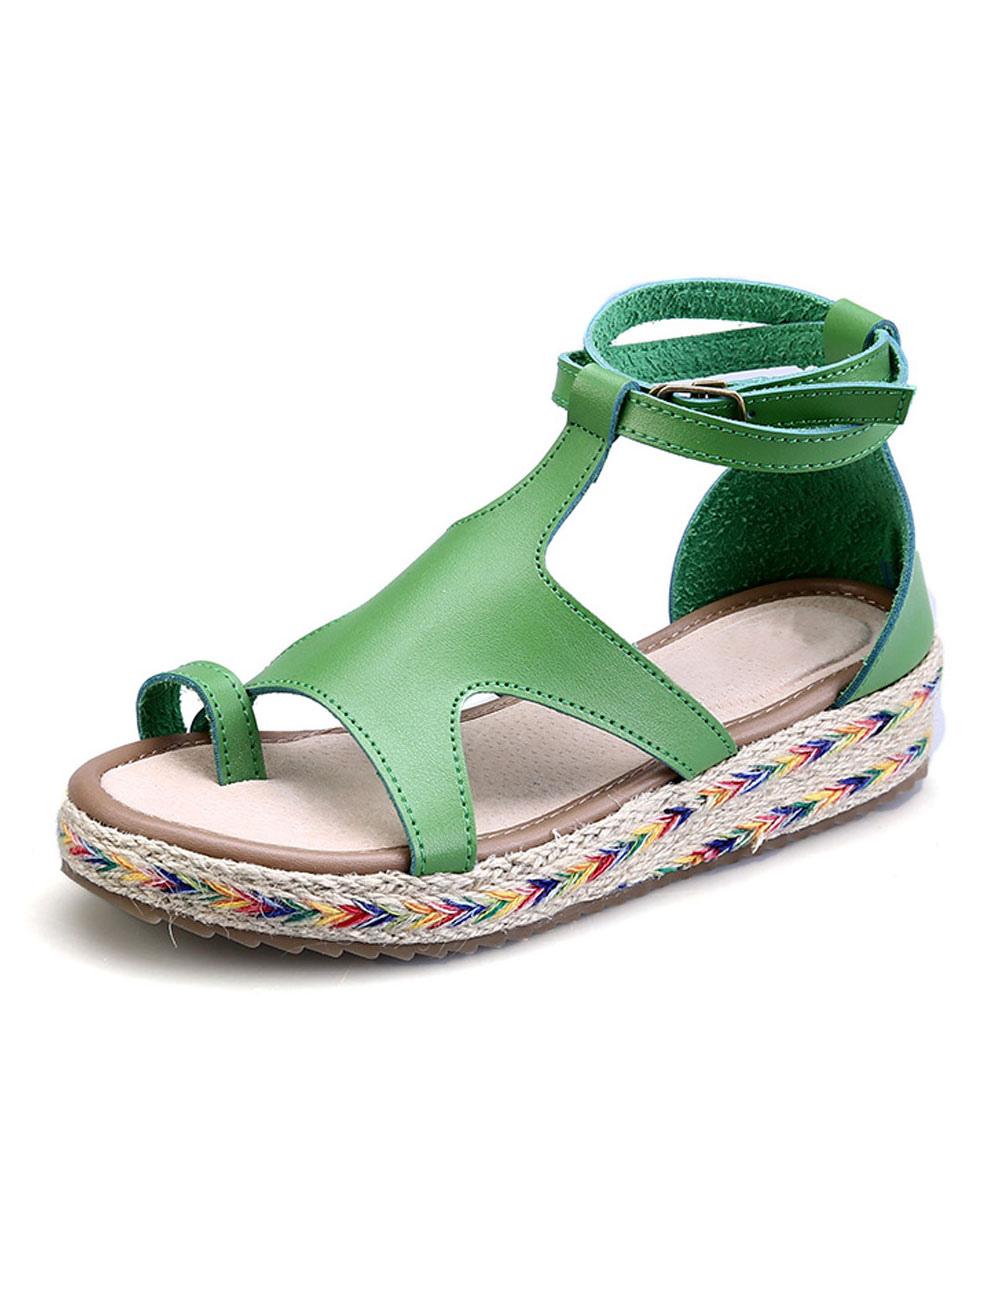 Women Casual Sandal Toe Ring Cut Out Strappy Buckled Women Open Toe Sandal